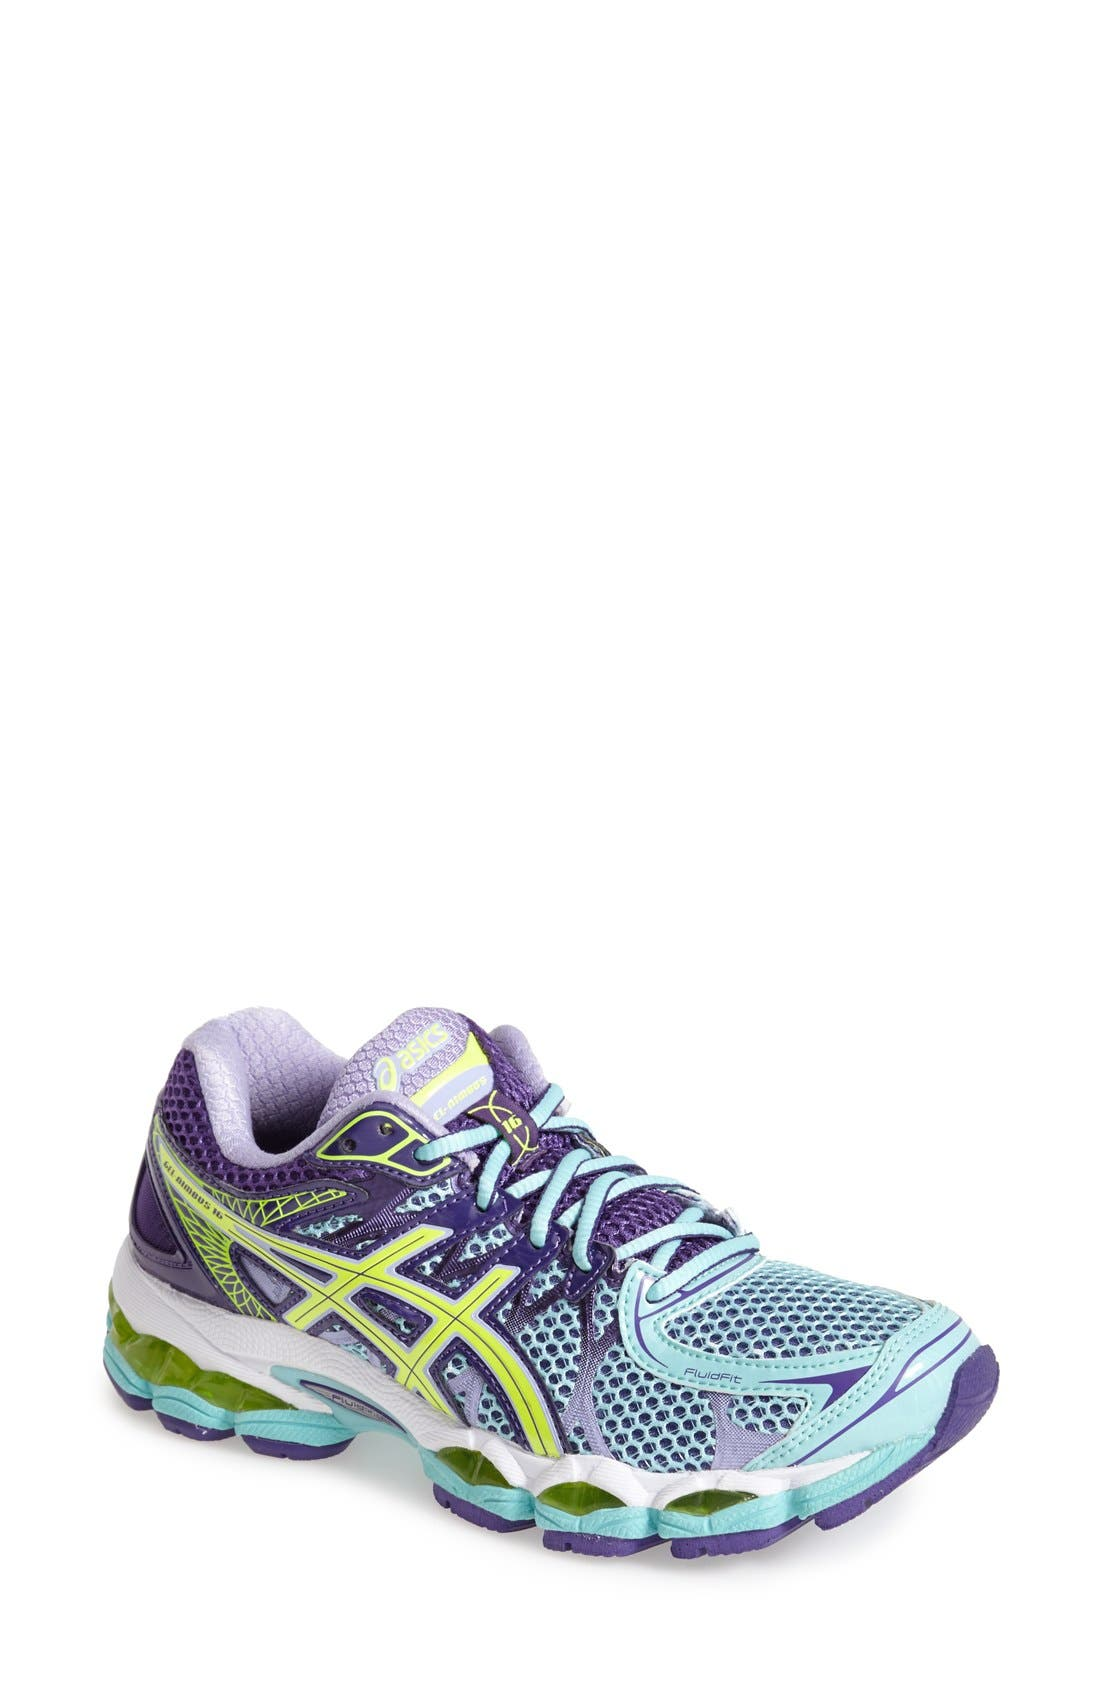 Alternate Image 1 Selected - ASICS® 'GEL-Nimbus 16' Running Shoe (Women)